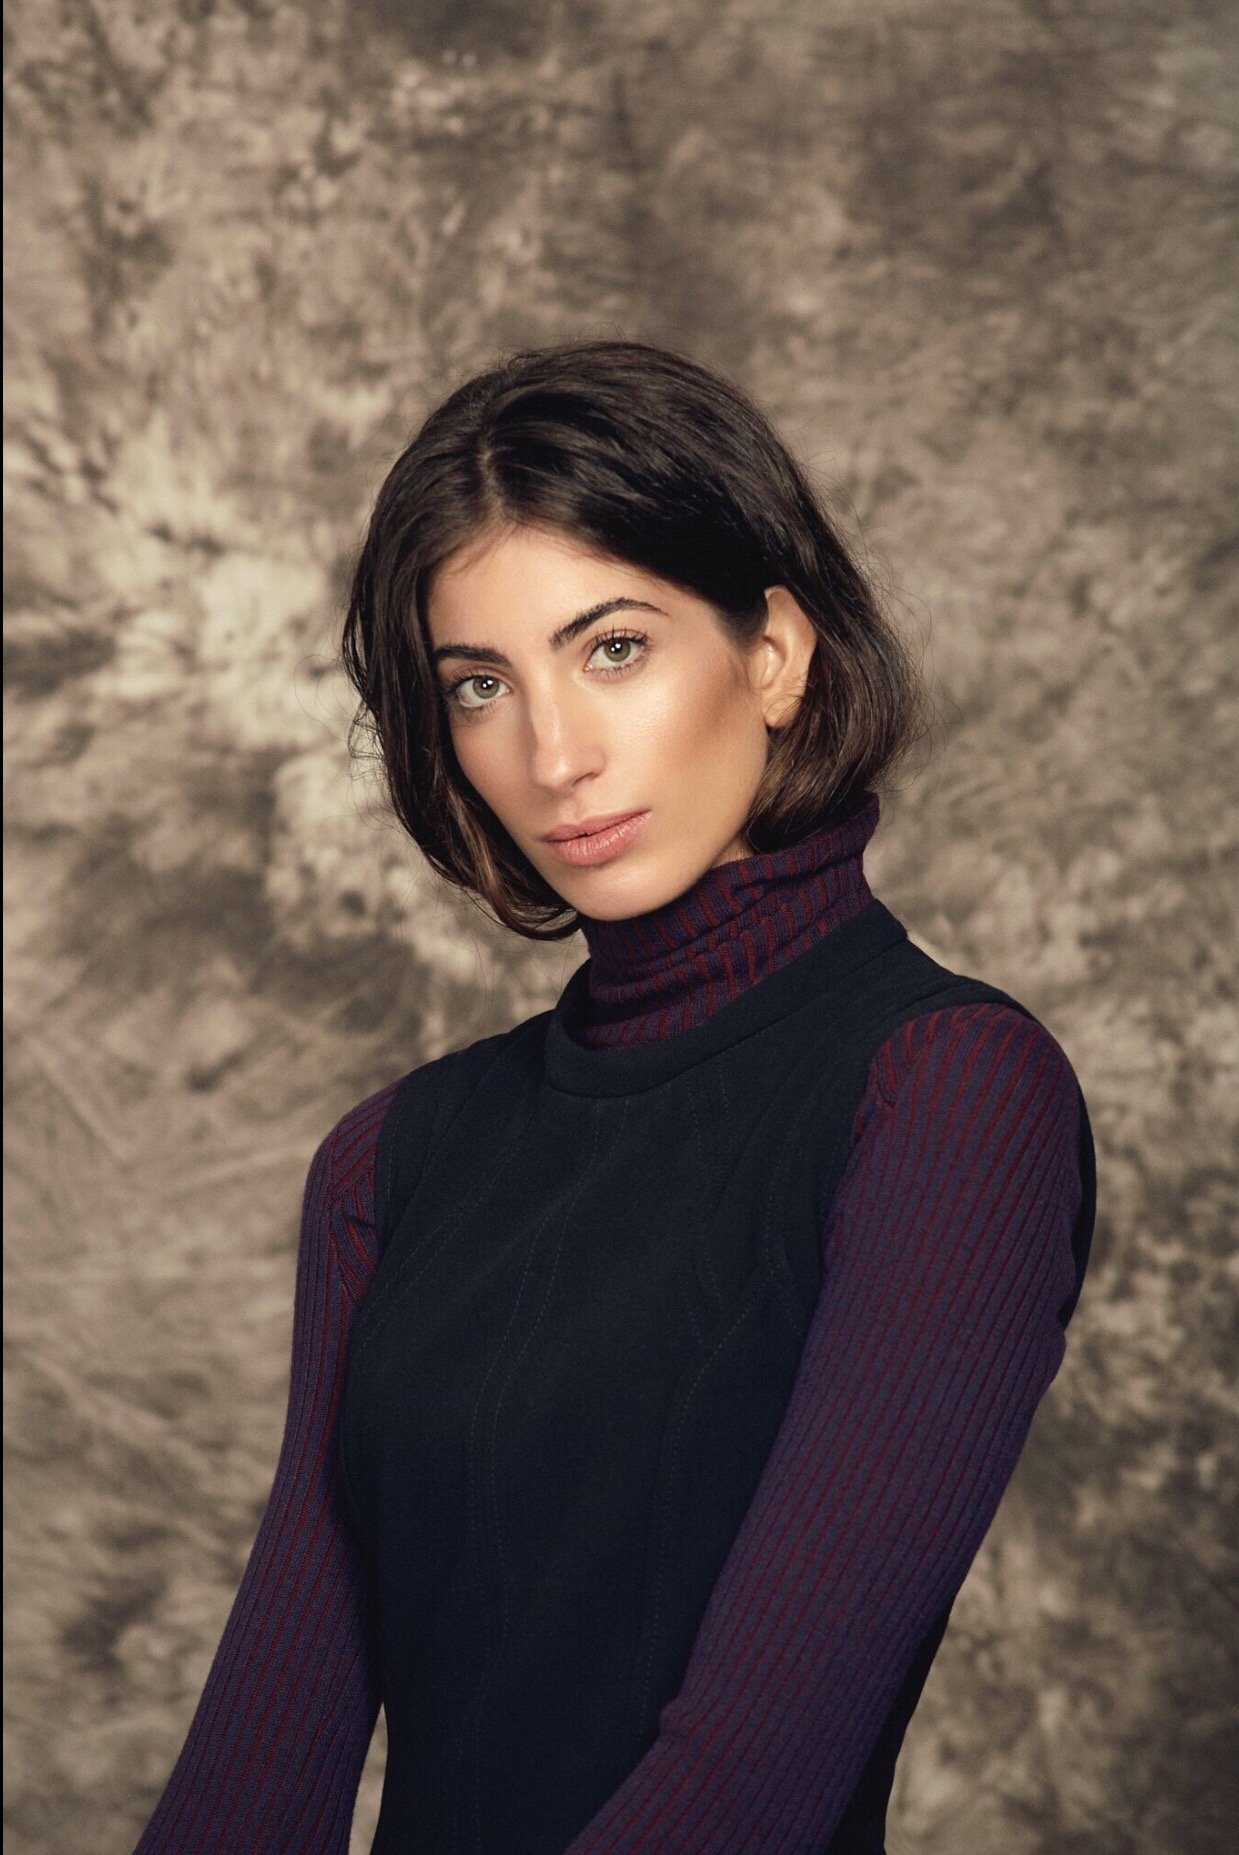 Martina Gutierrez